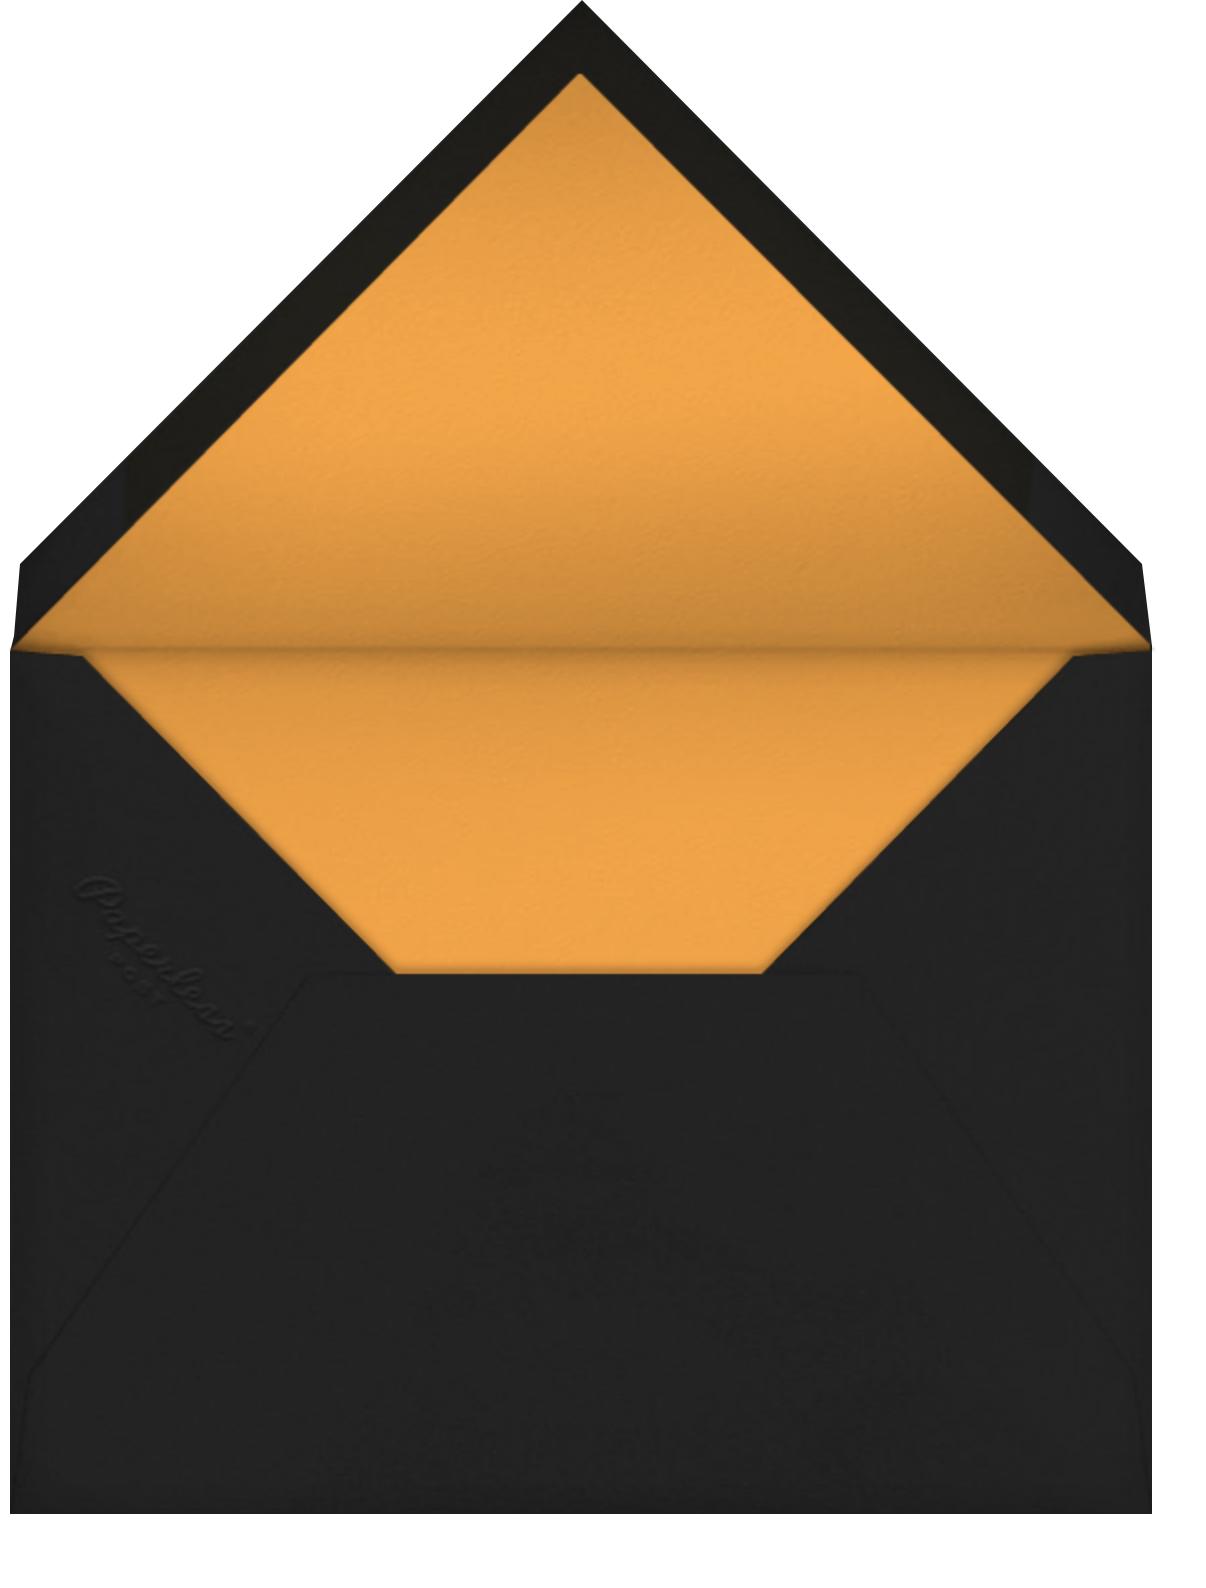 Haunted Pumpkin - Paperless Post - Halloween - envelope back